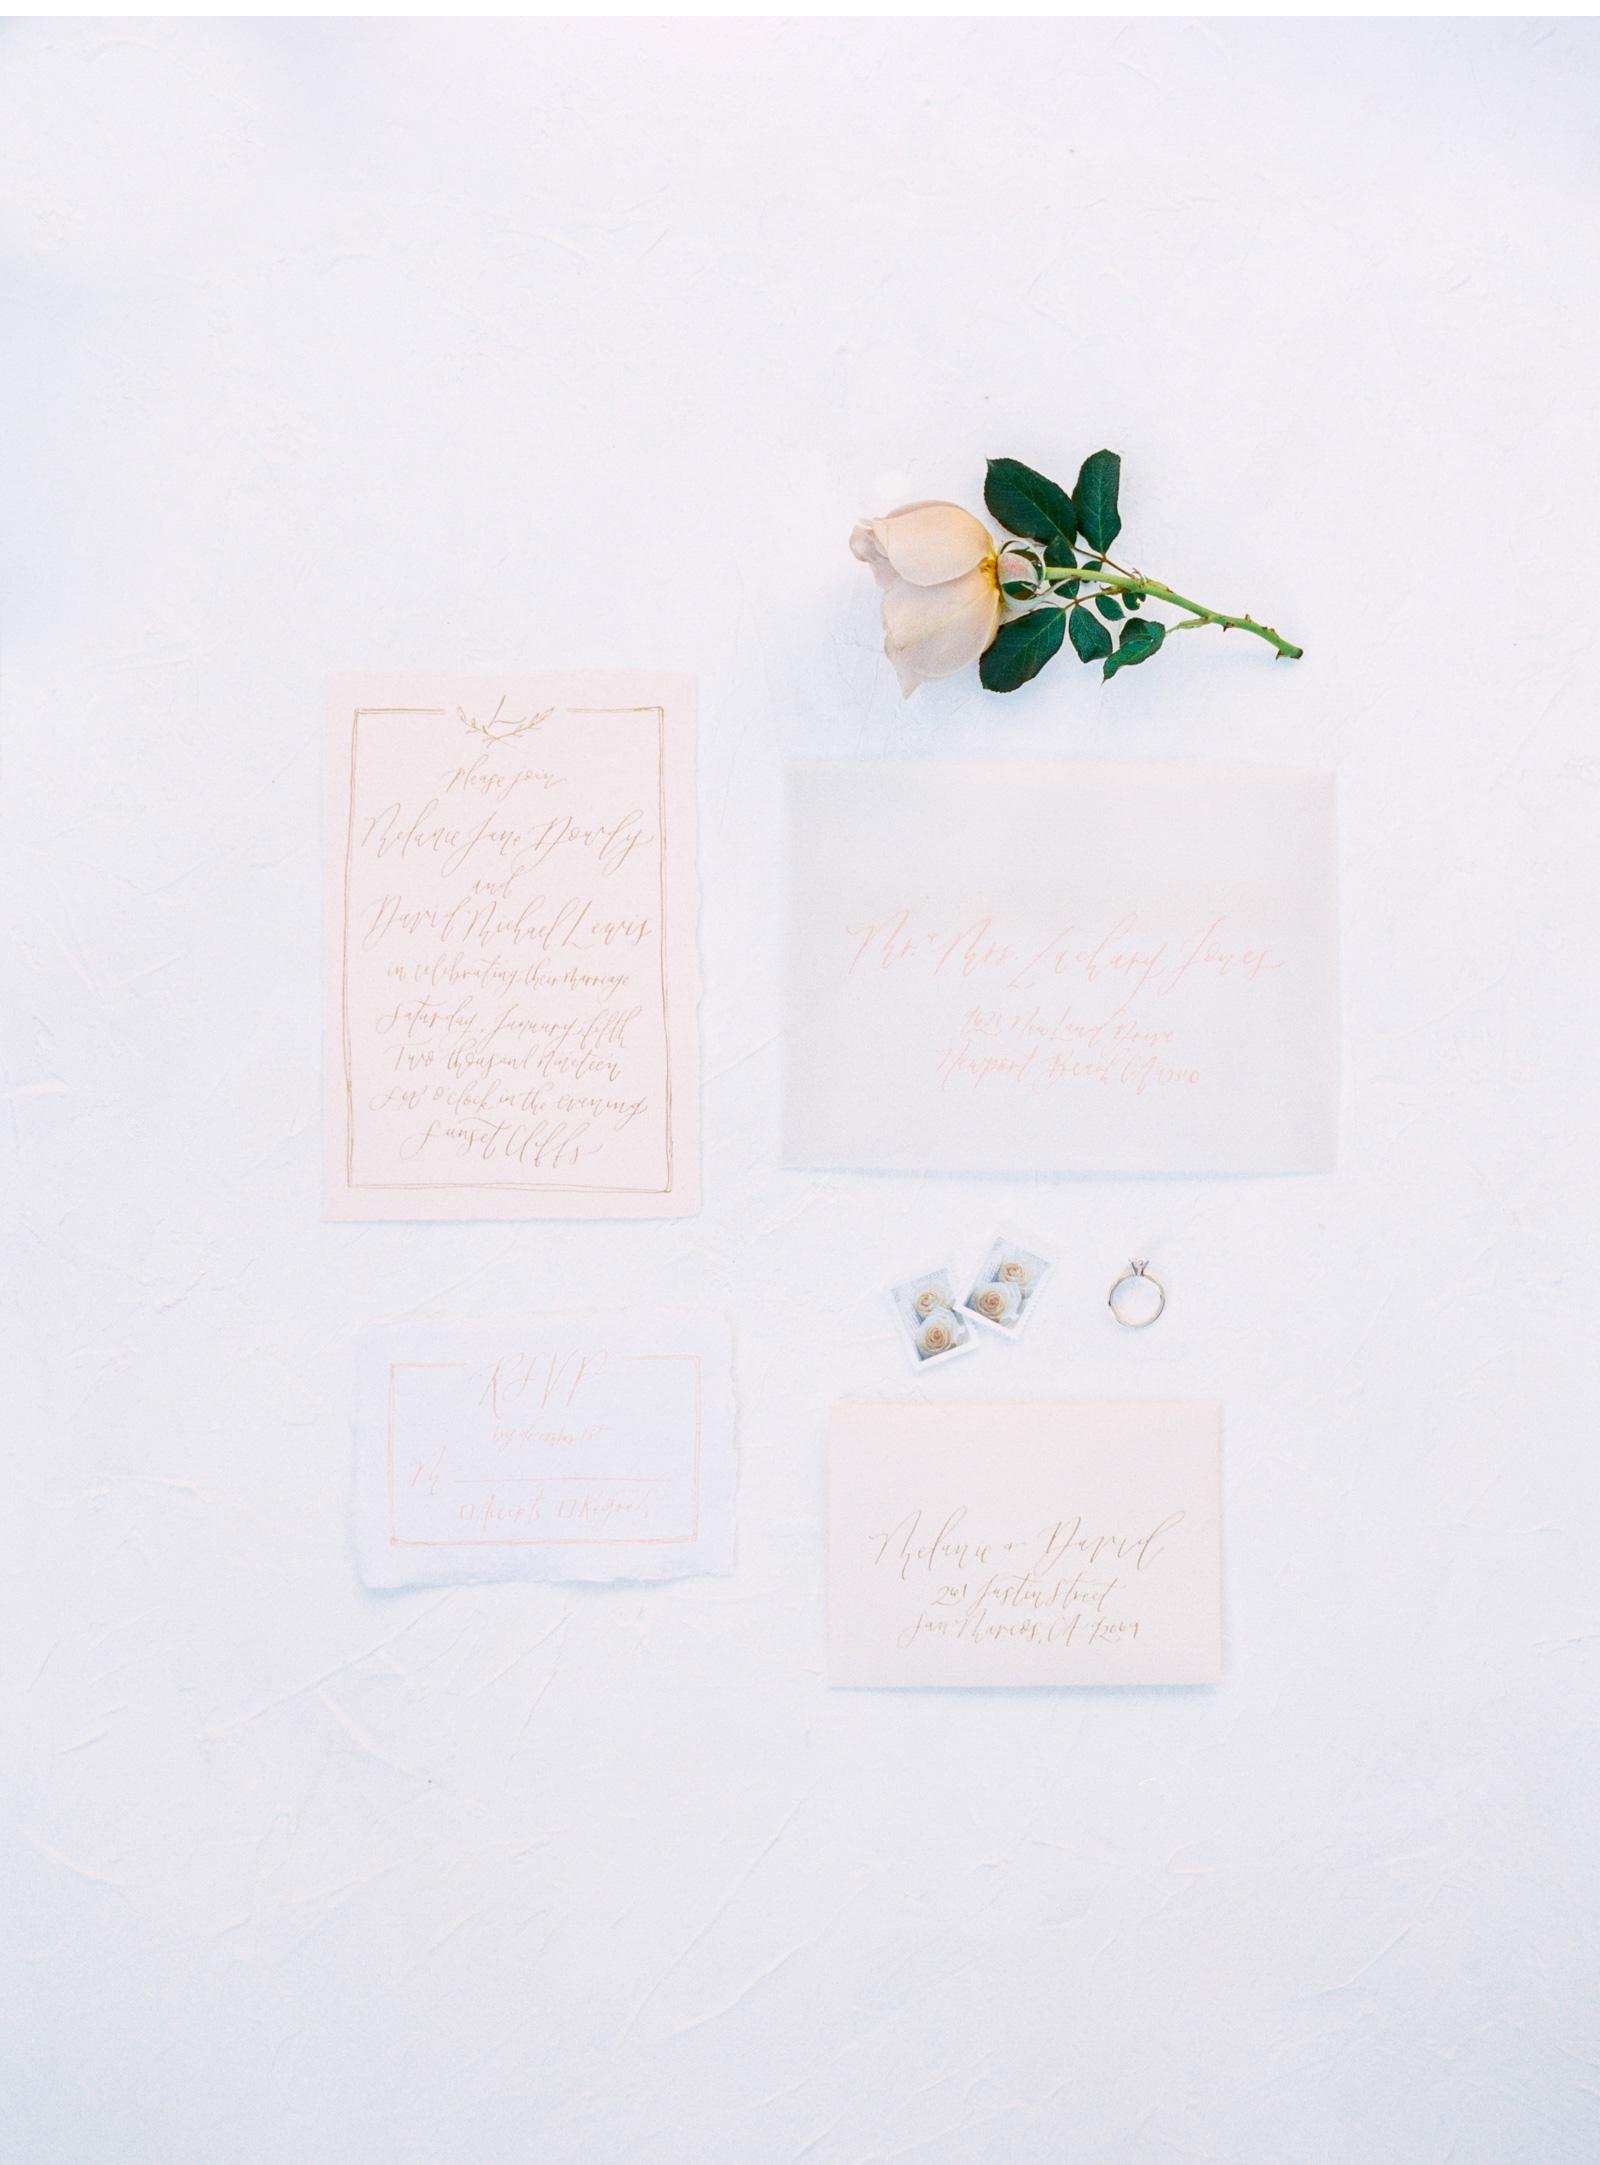 Hawaii-Fine-Art-Wedding-Photographer-Natalie-Schutt-Photography-Style-Me-Pretty_05.jpg